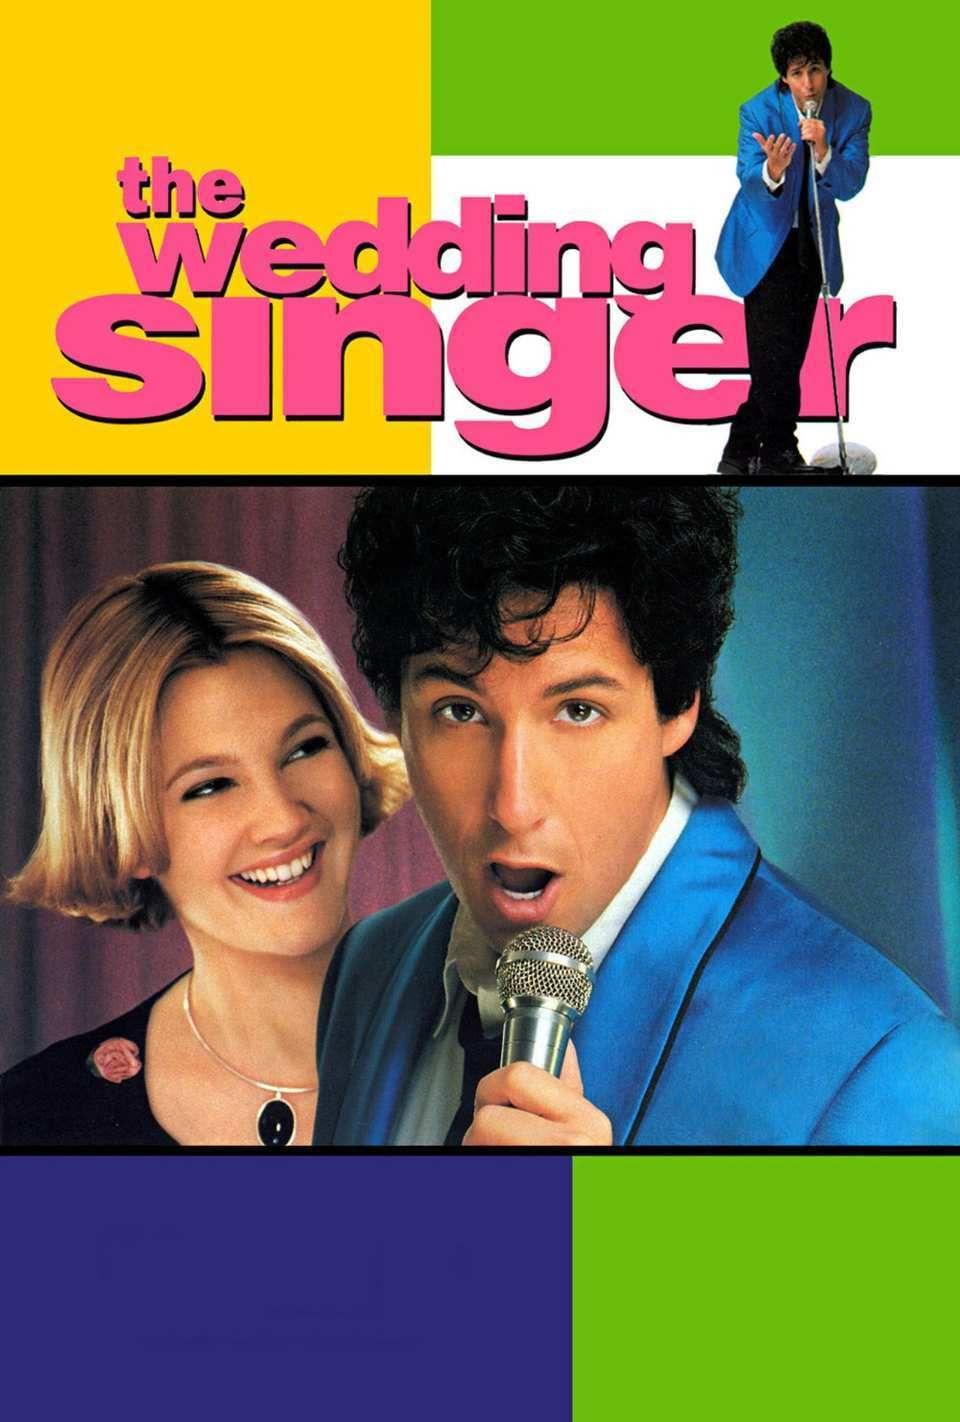 Read the The Wedding Singer (1998) script written by Tim